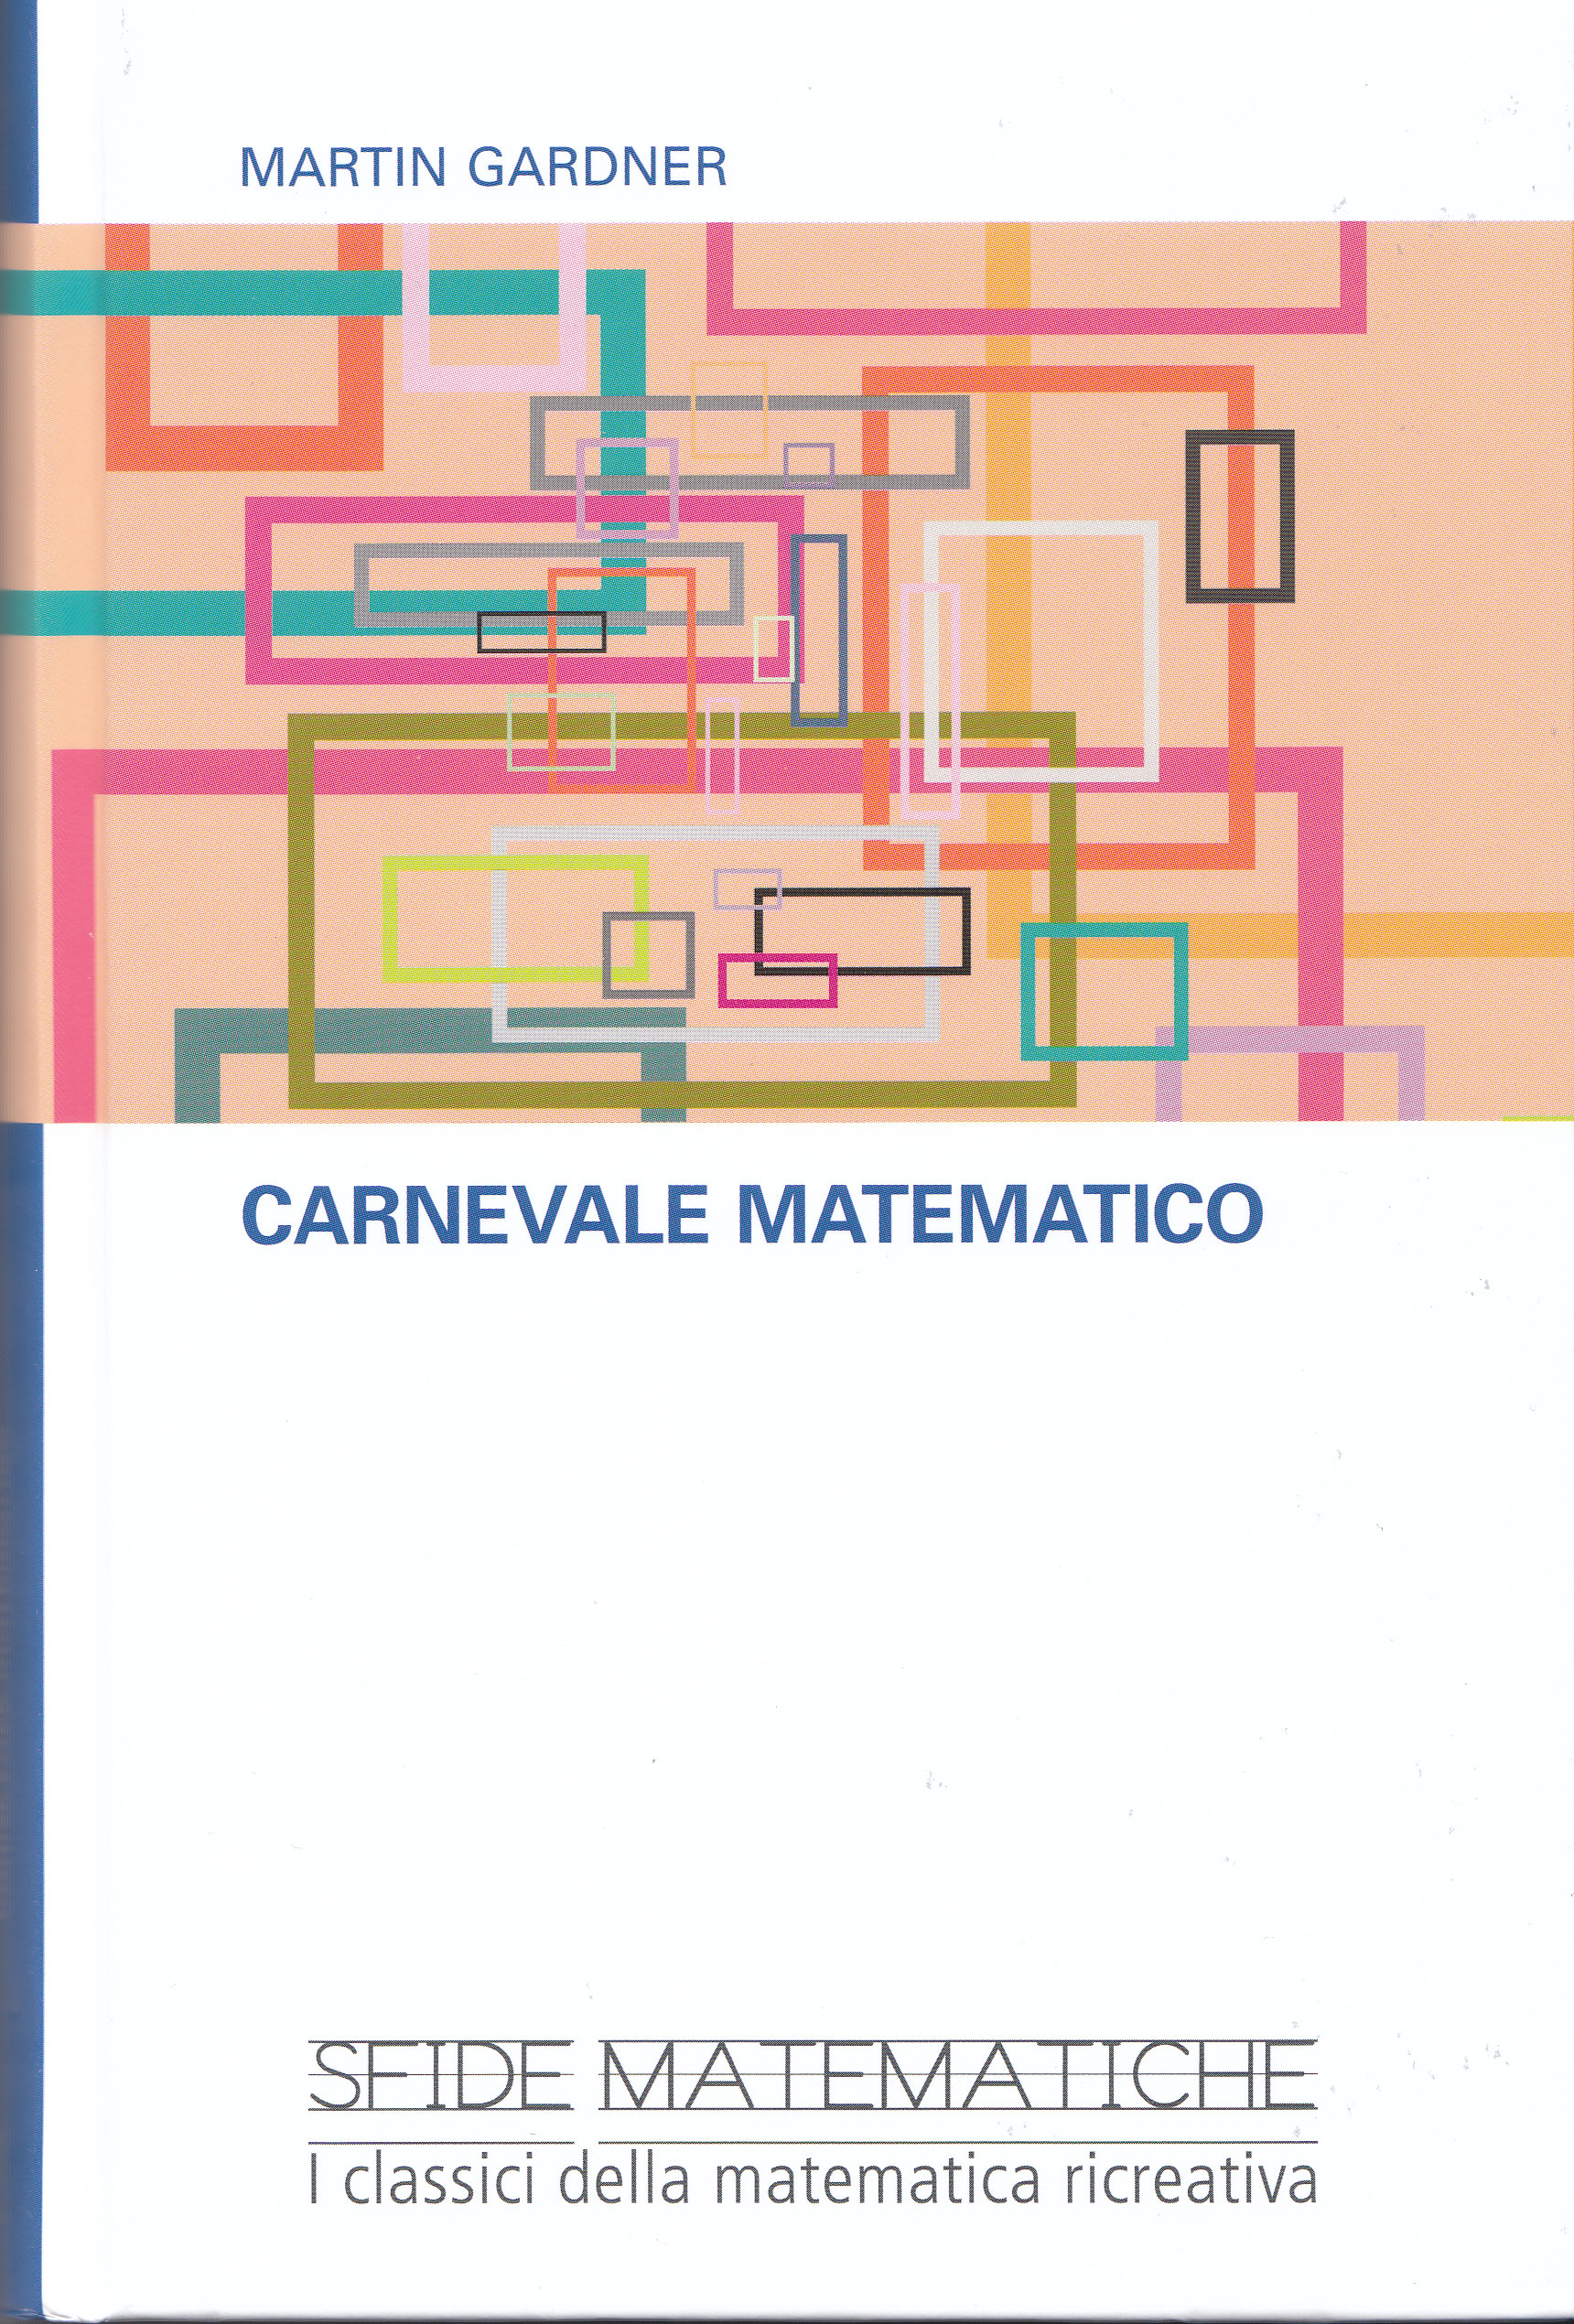 Carnevale matematico